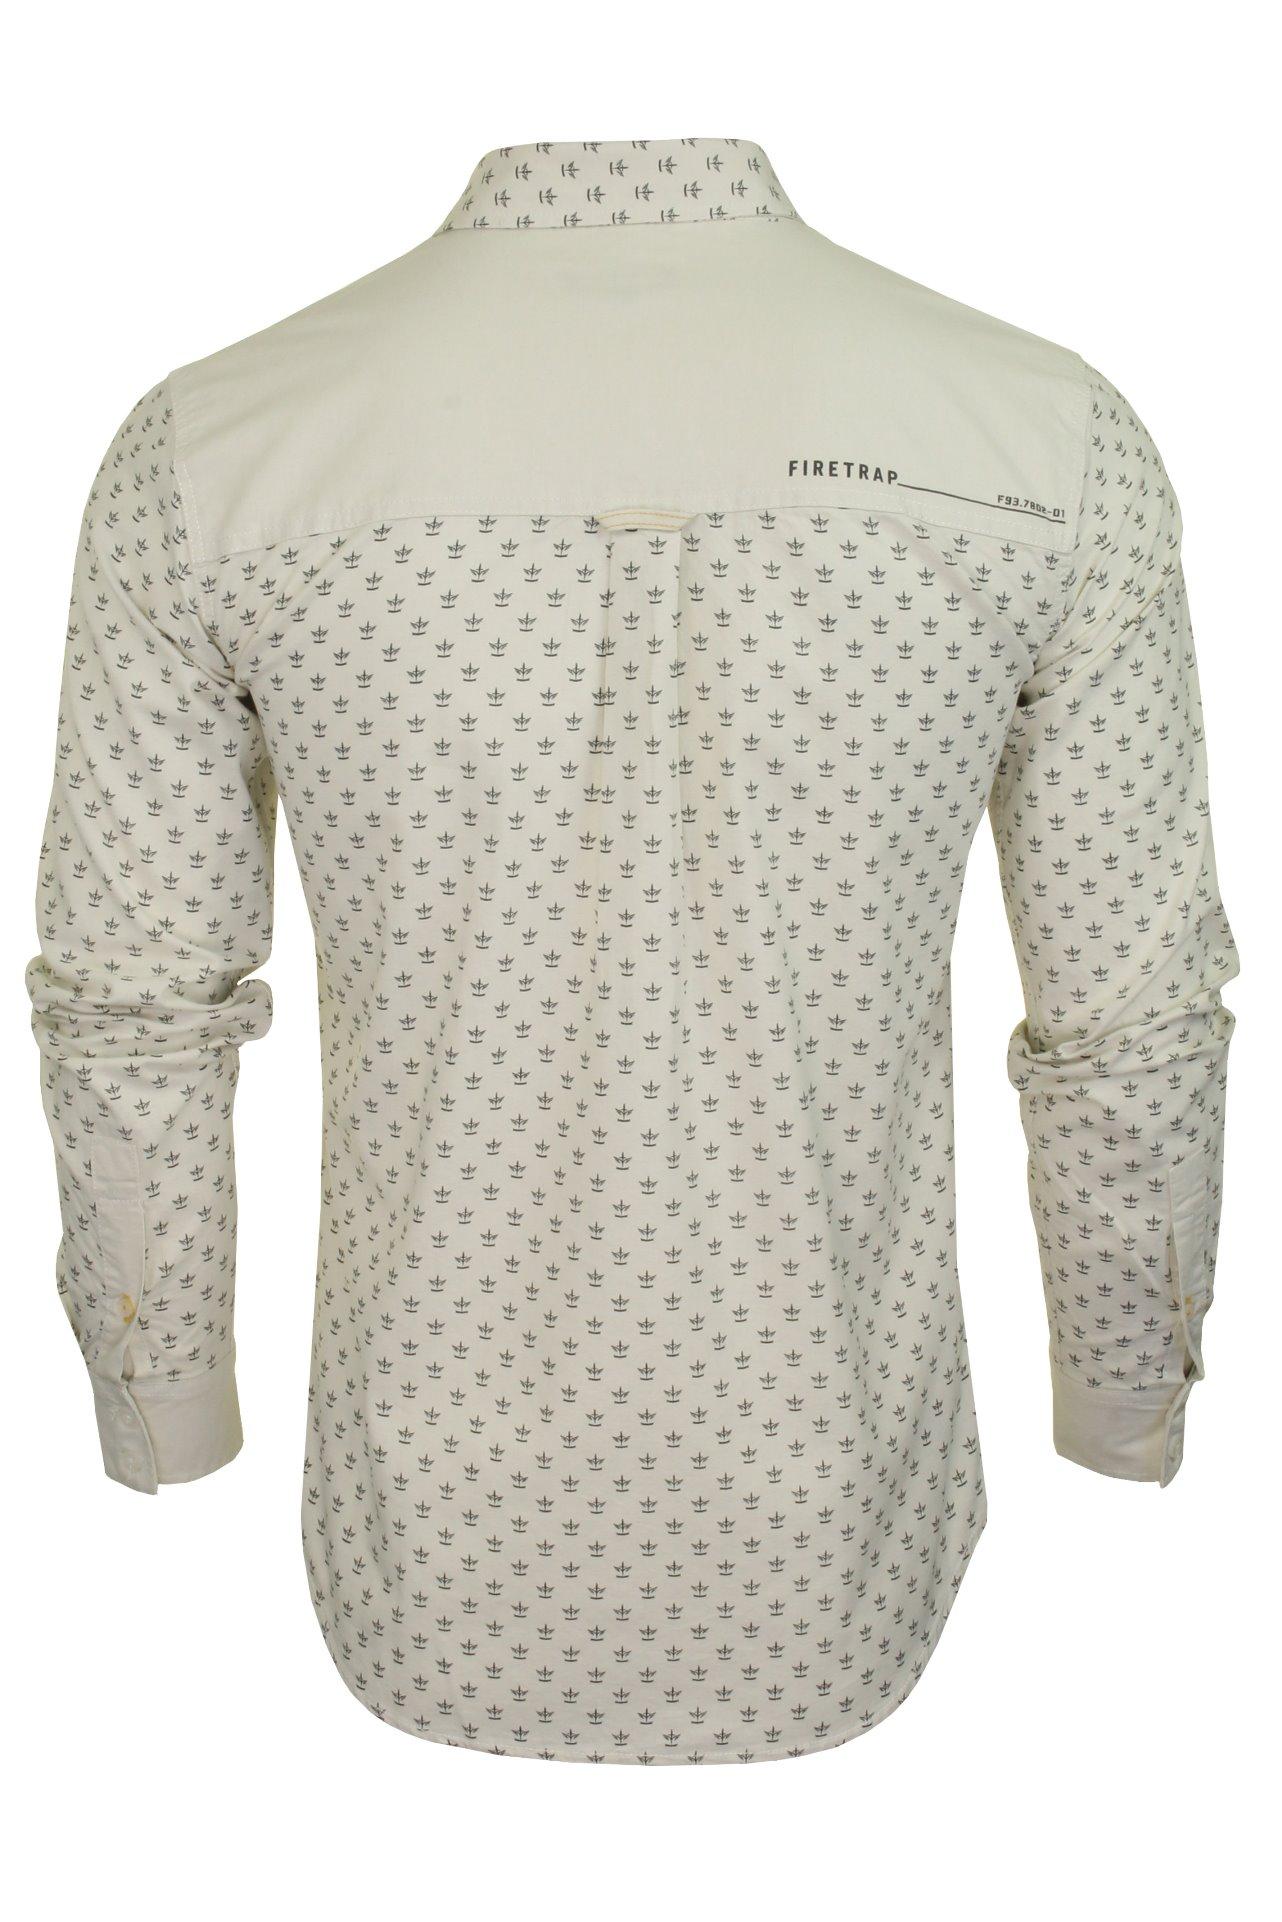 Para-Hombres-Camisa-De-Mezclilla-por-Firetrap-Western-Lavado-Vintage-Manga-Larga miniatura 10